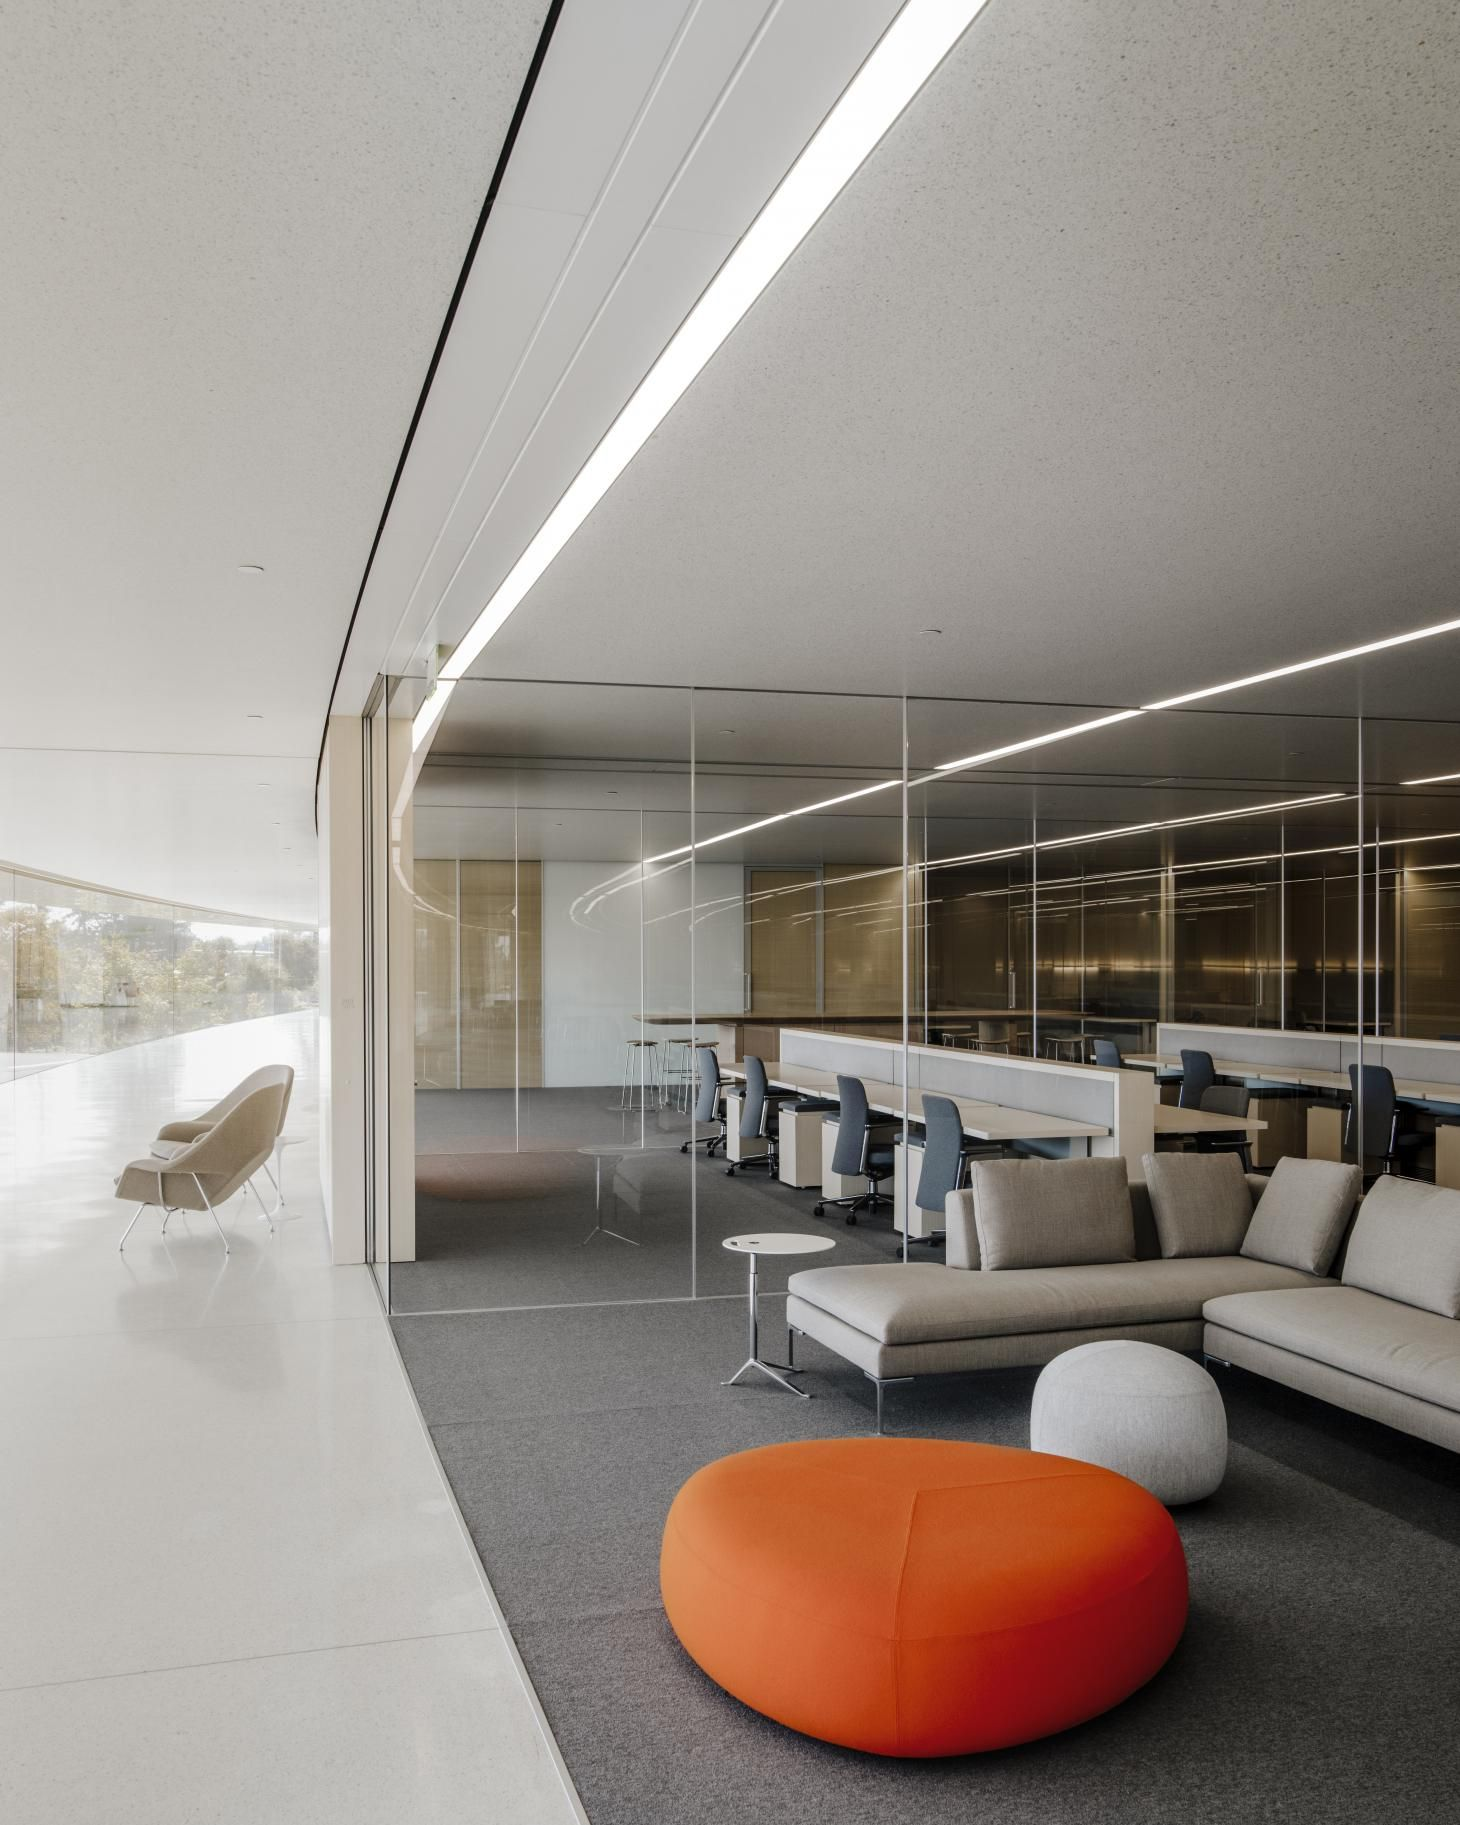 Office Design The Latest Trends In Workspace Architecture Office Interior Design Modern Workspace Design Corporate Office Design,Cool Easy Halloween Pumpkin Designs